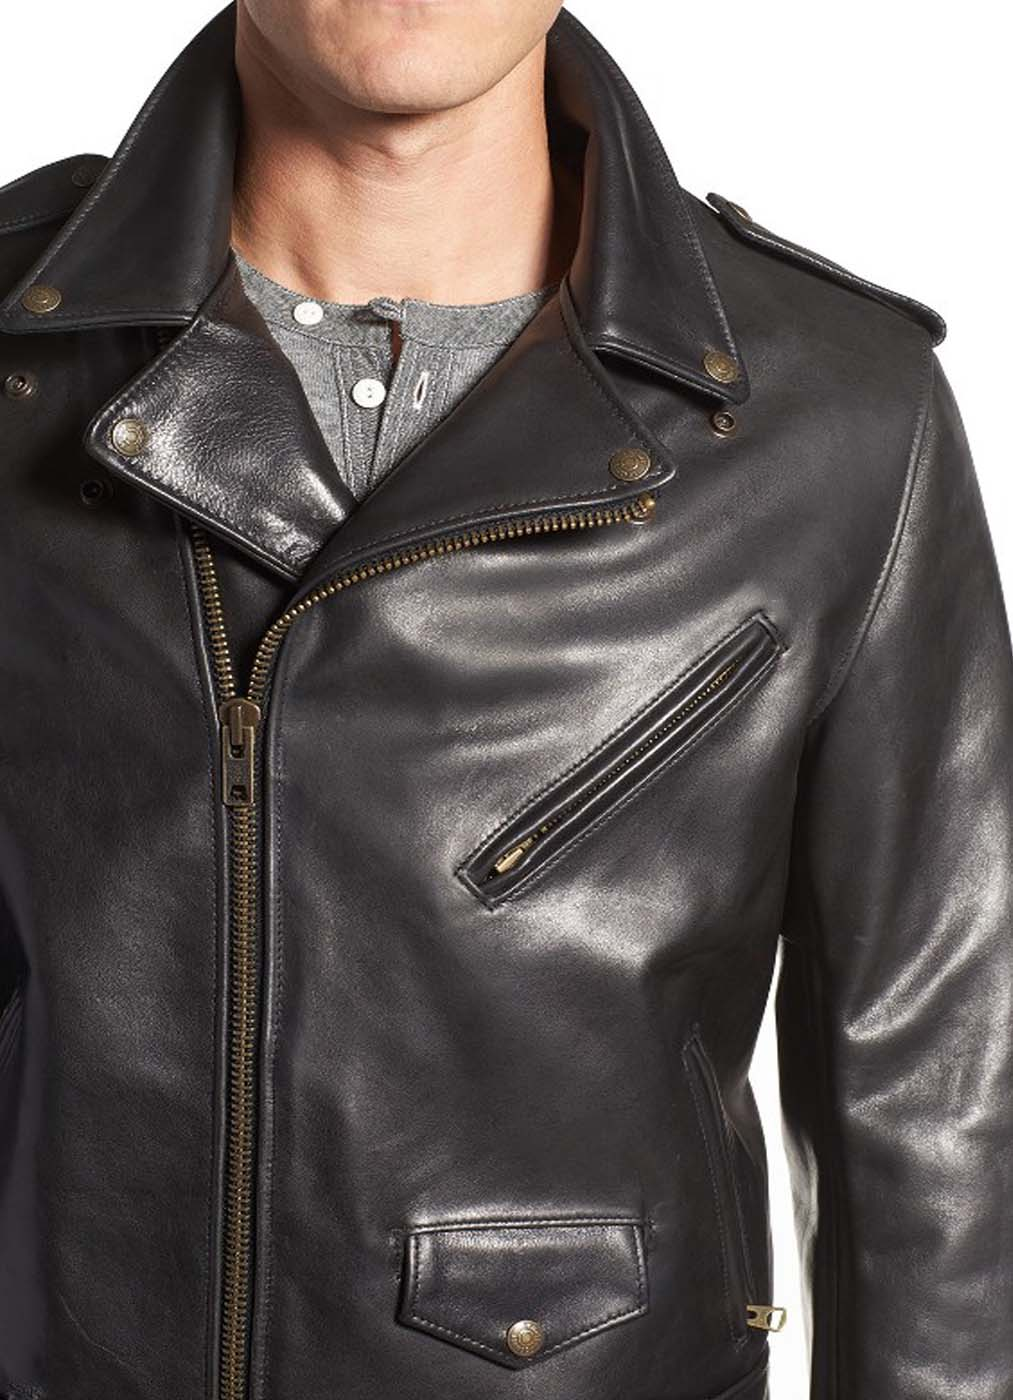 Leather Moto Jacket For Men.